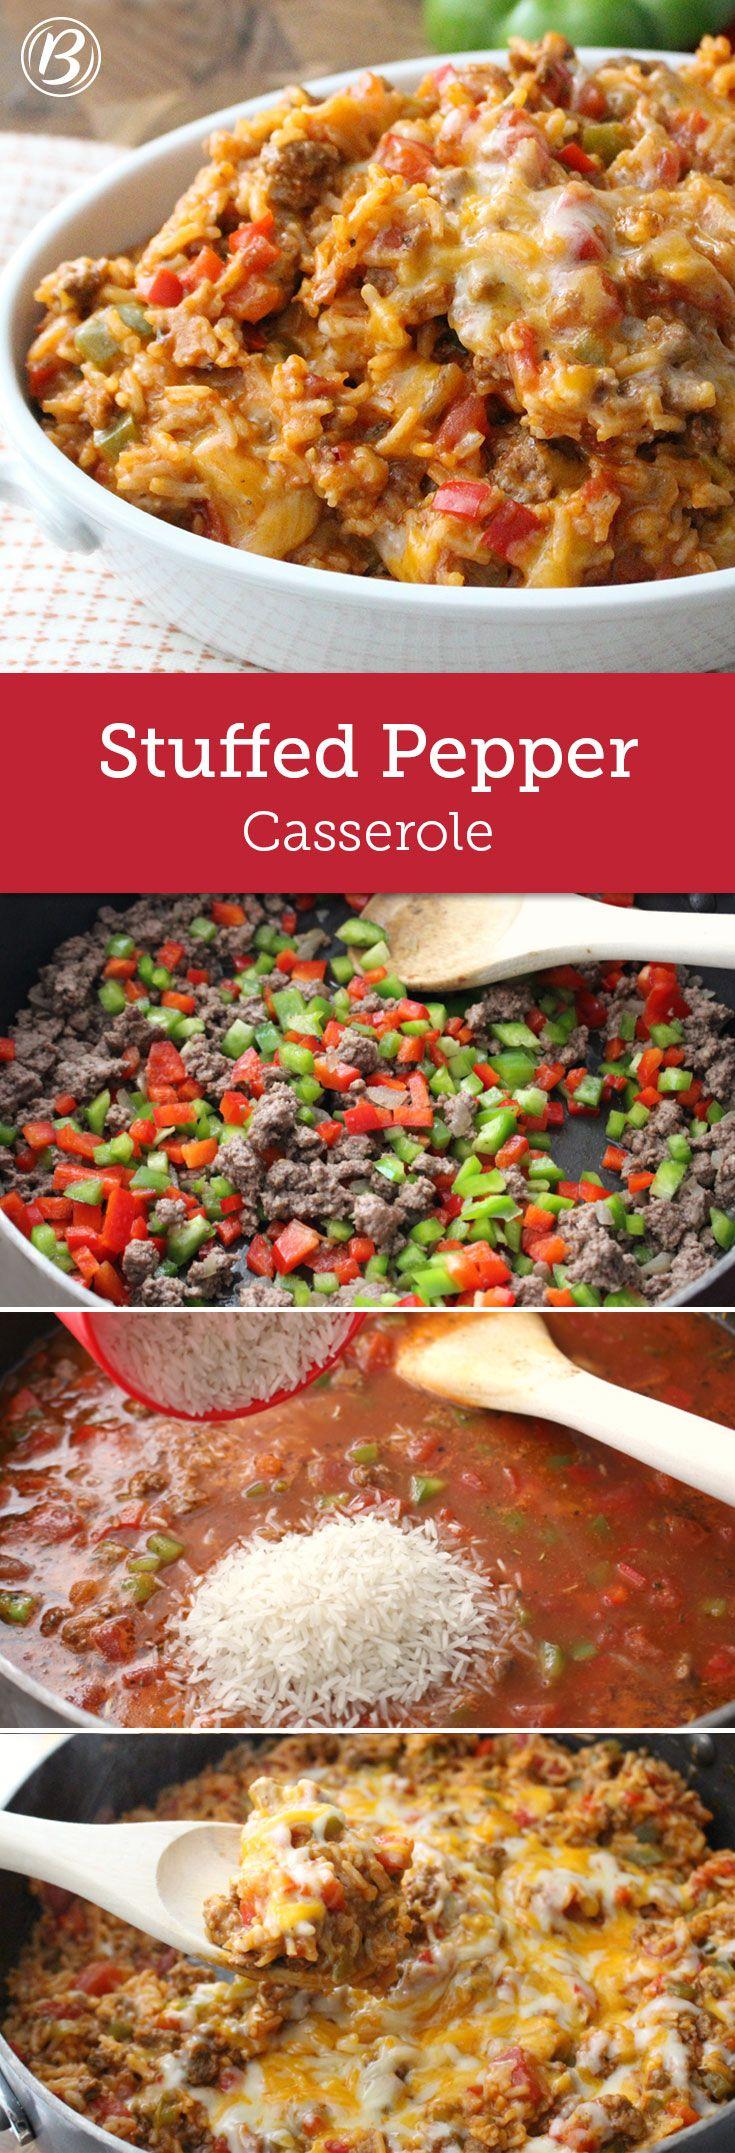 Stuffed Pepper Casserole Recipe Stuffed Peppers Recipes Food